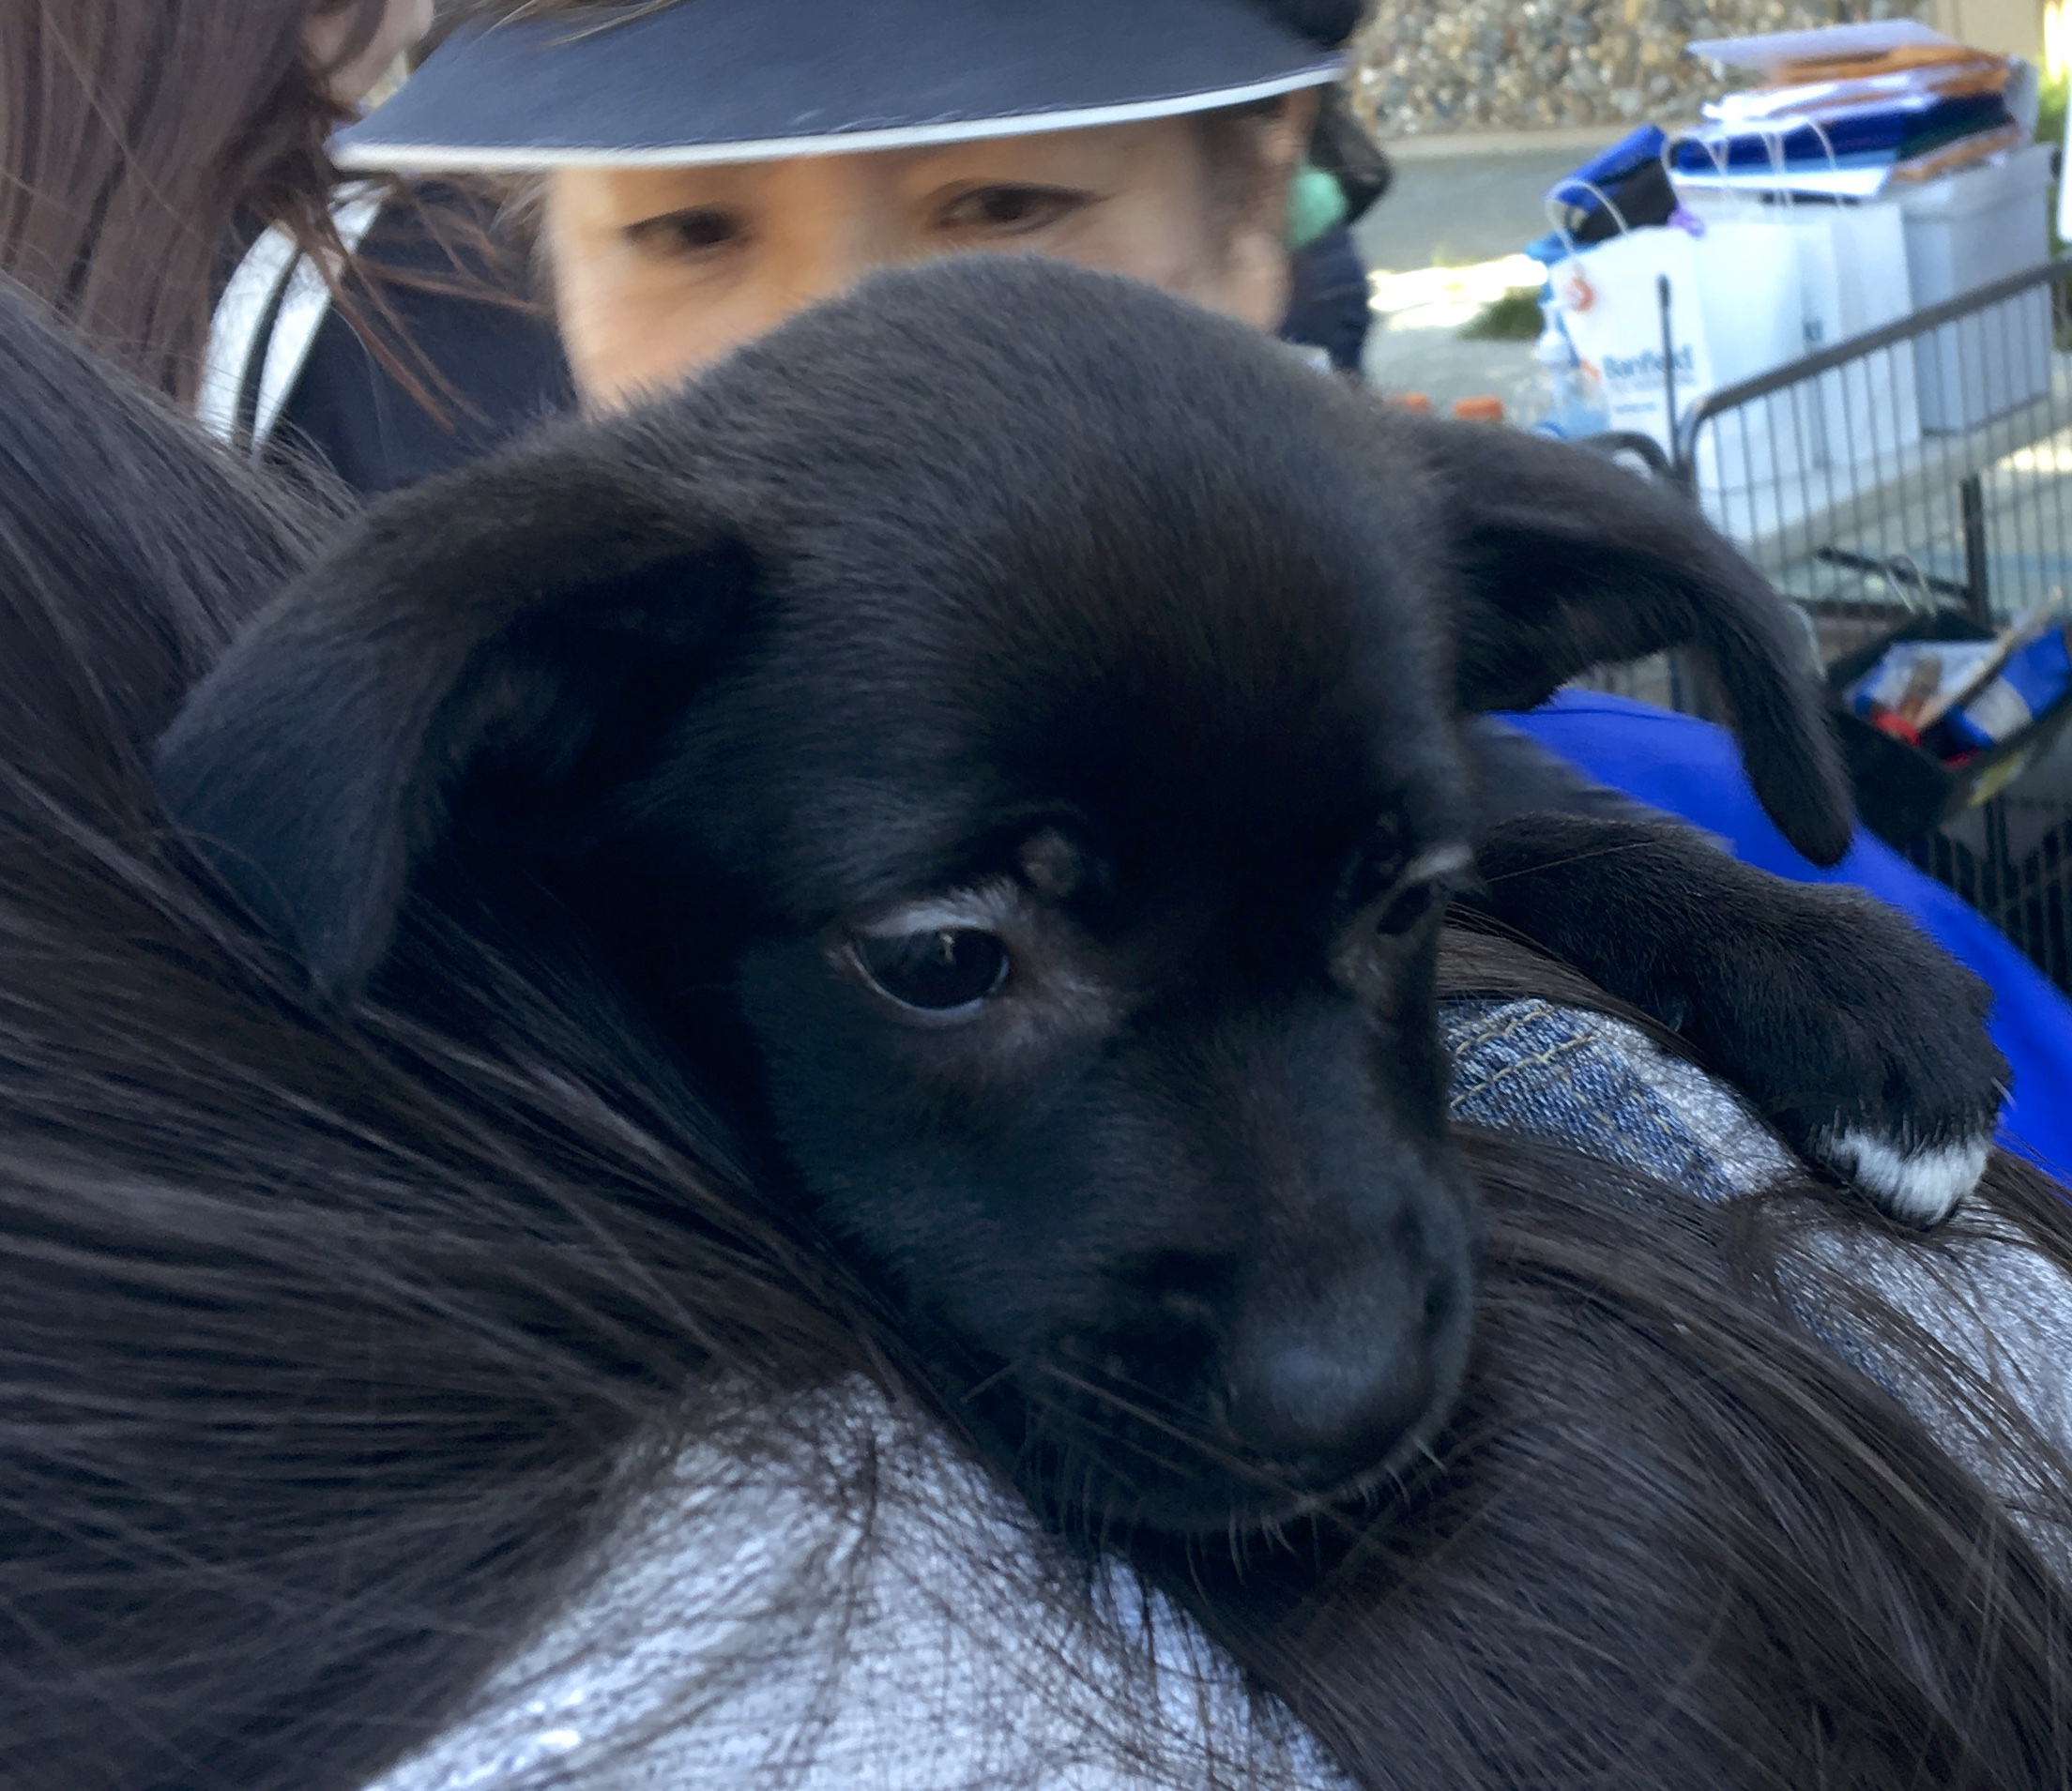 Labrador Retriever Mix Puppy Being Hugged